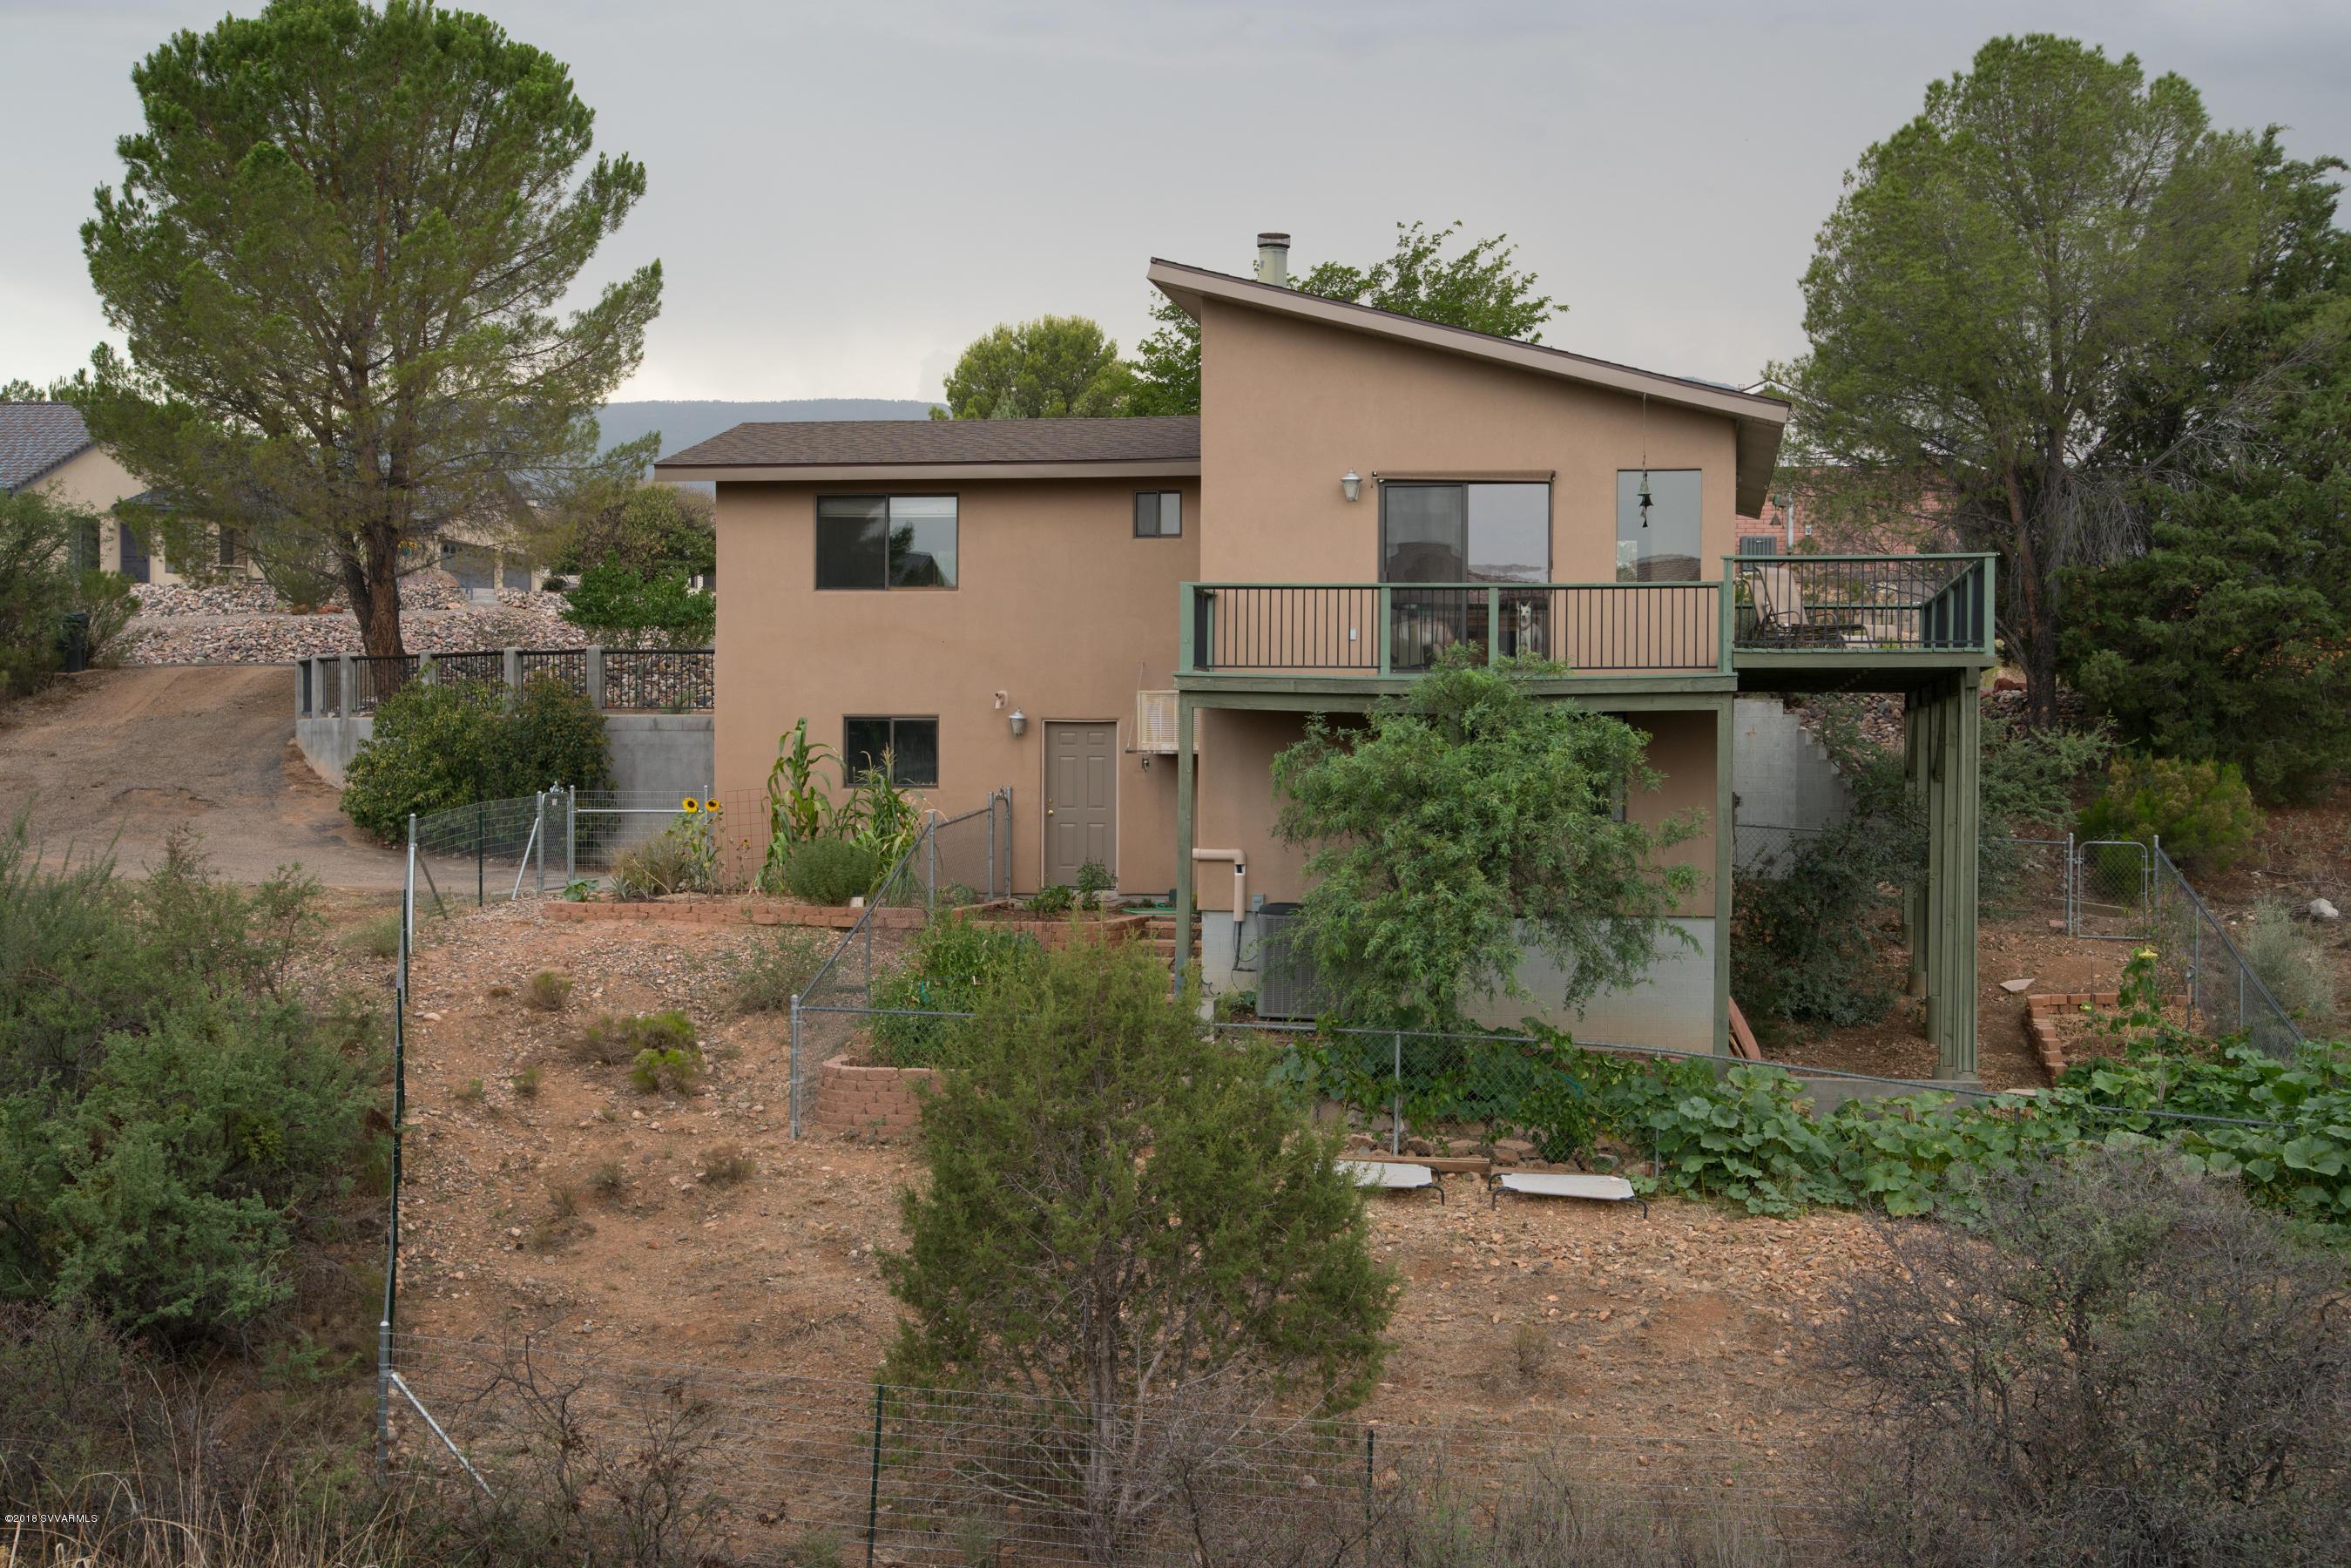 1699 S Cactus Wren Rd Cottonwood, AZ 86326